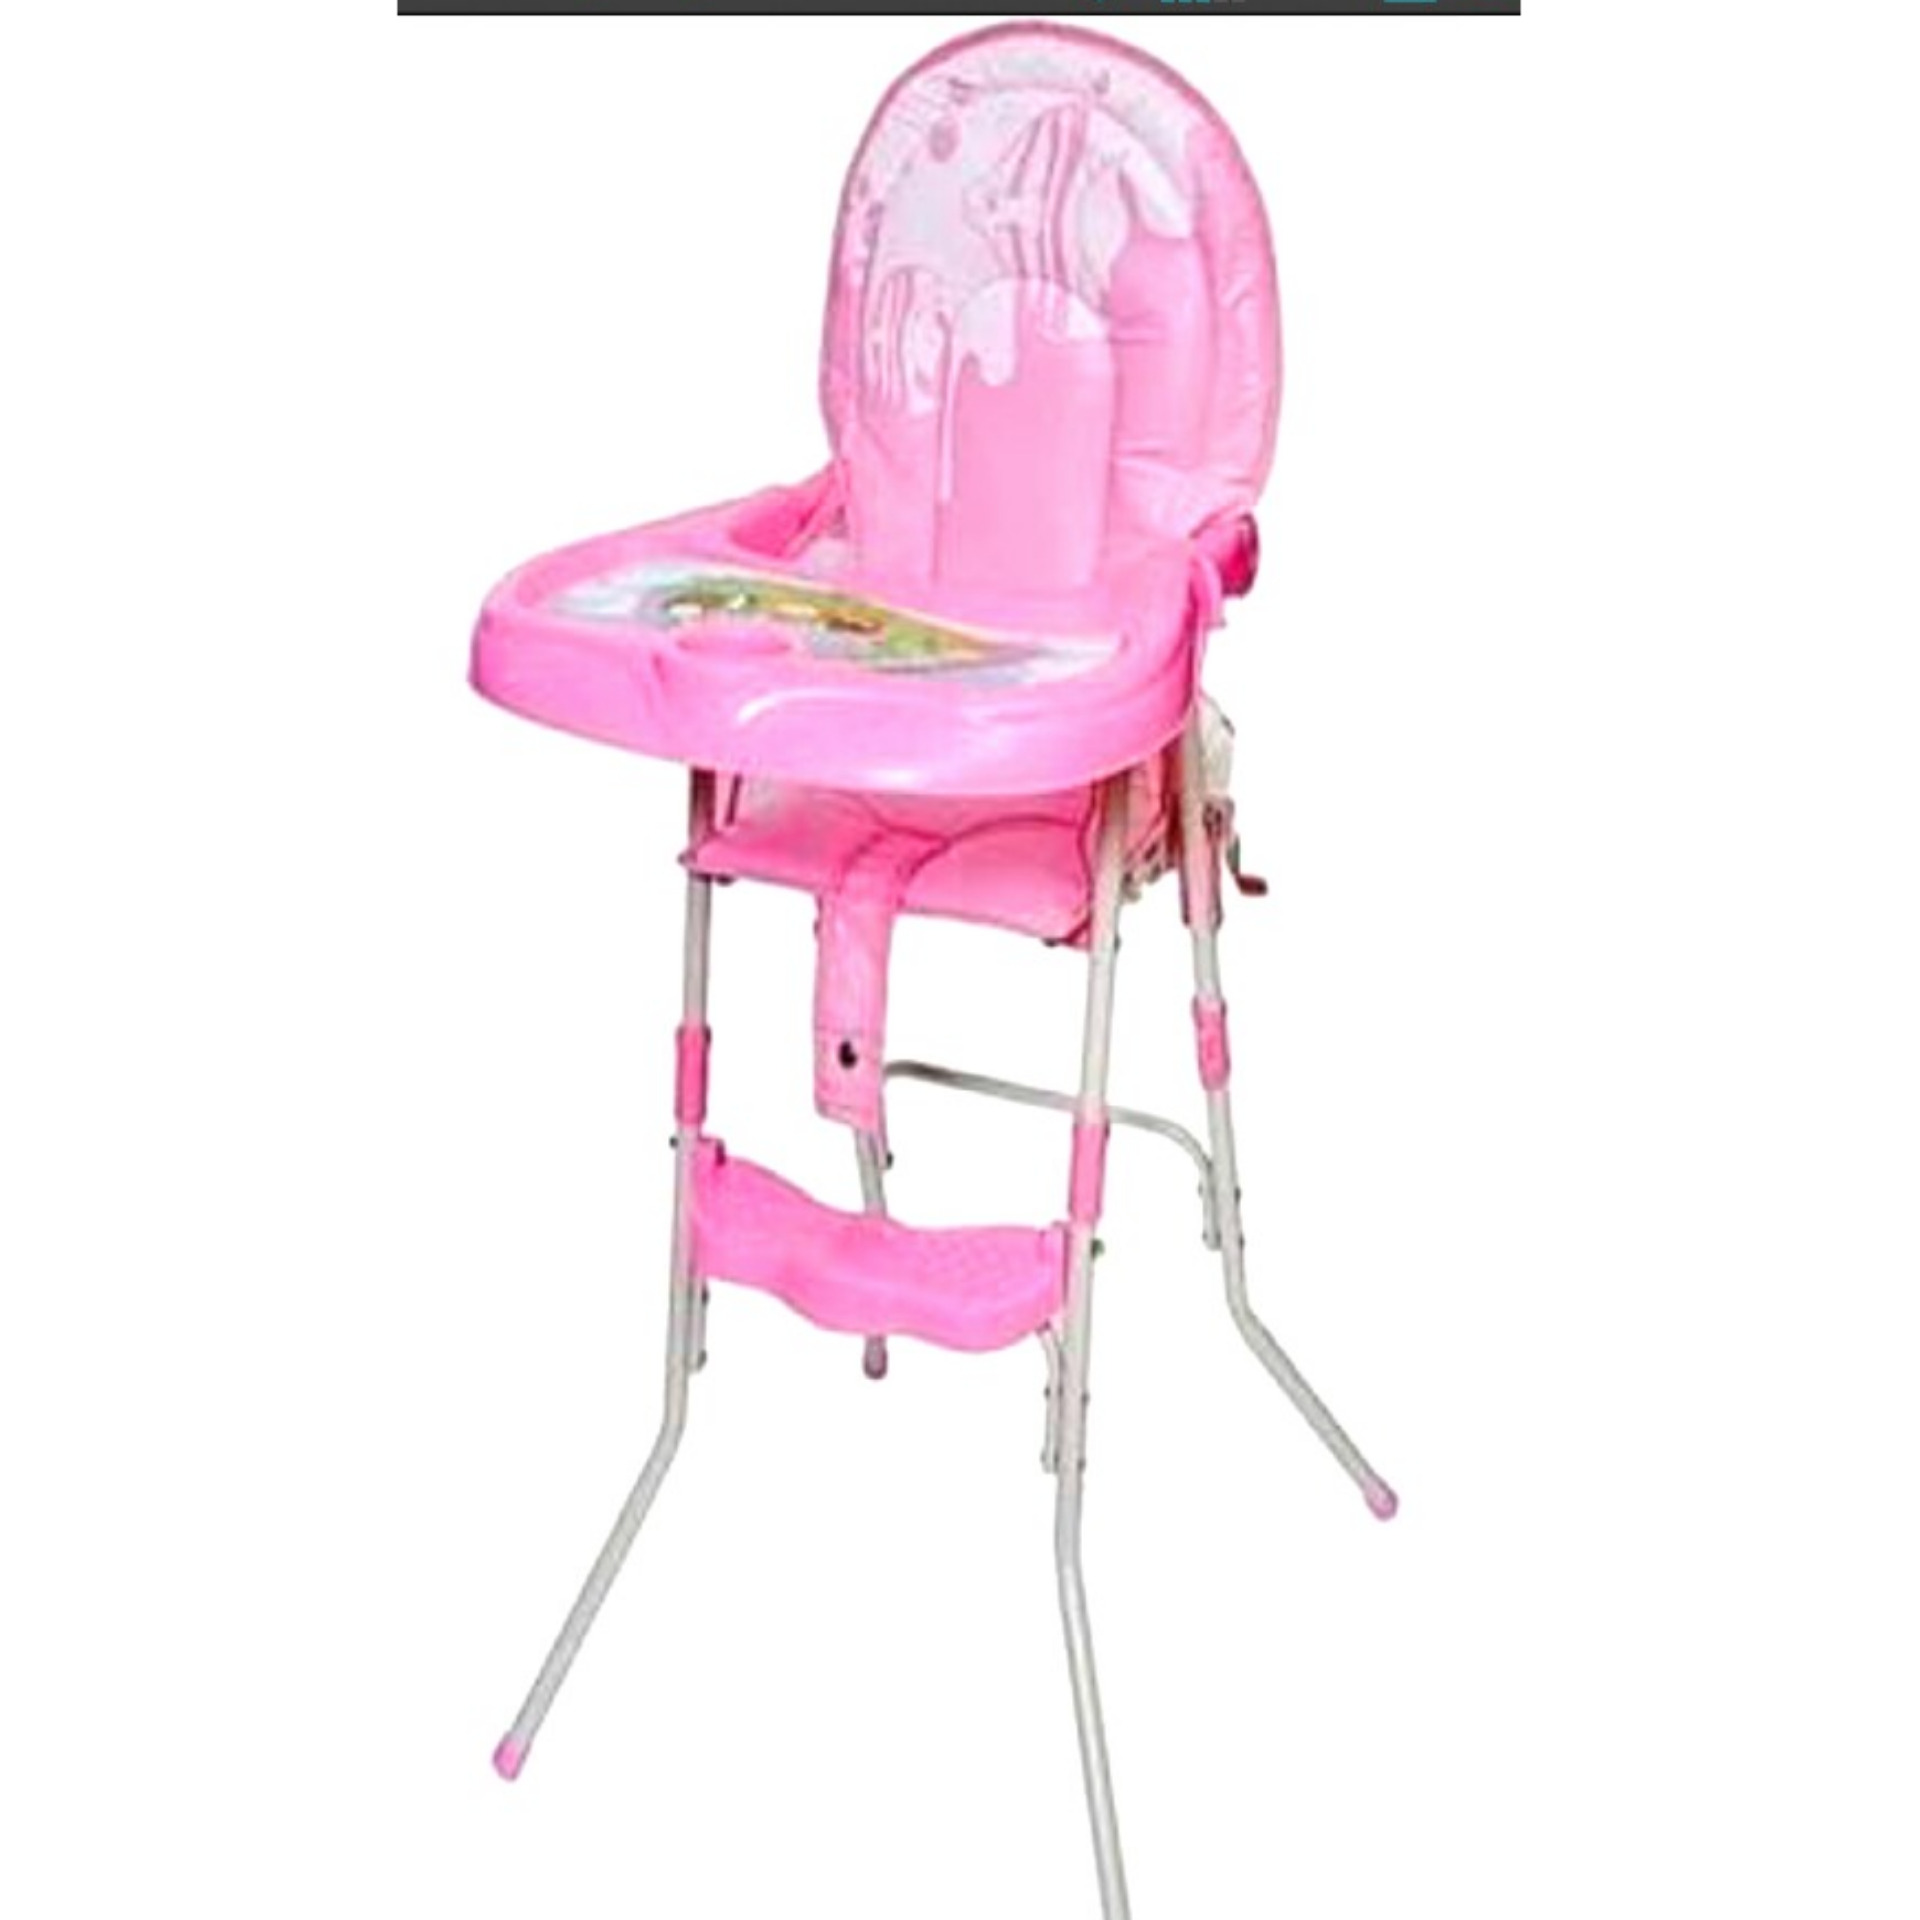 baby dining chair n high chair